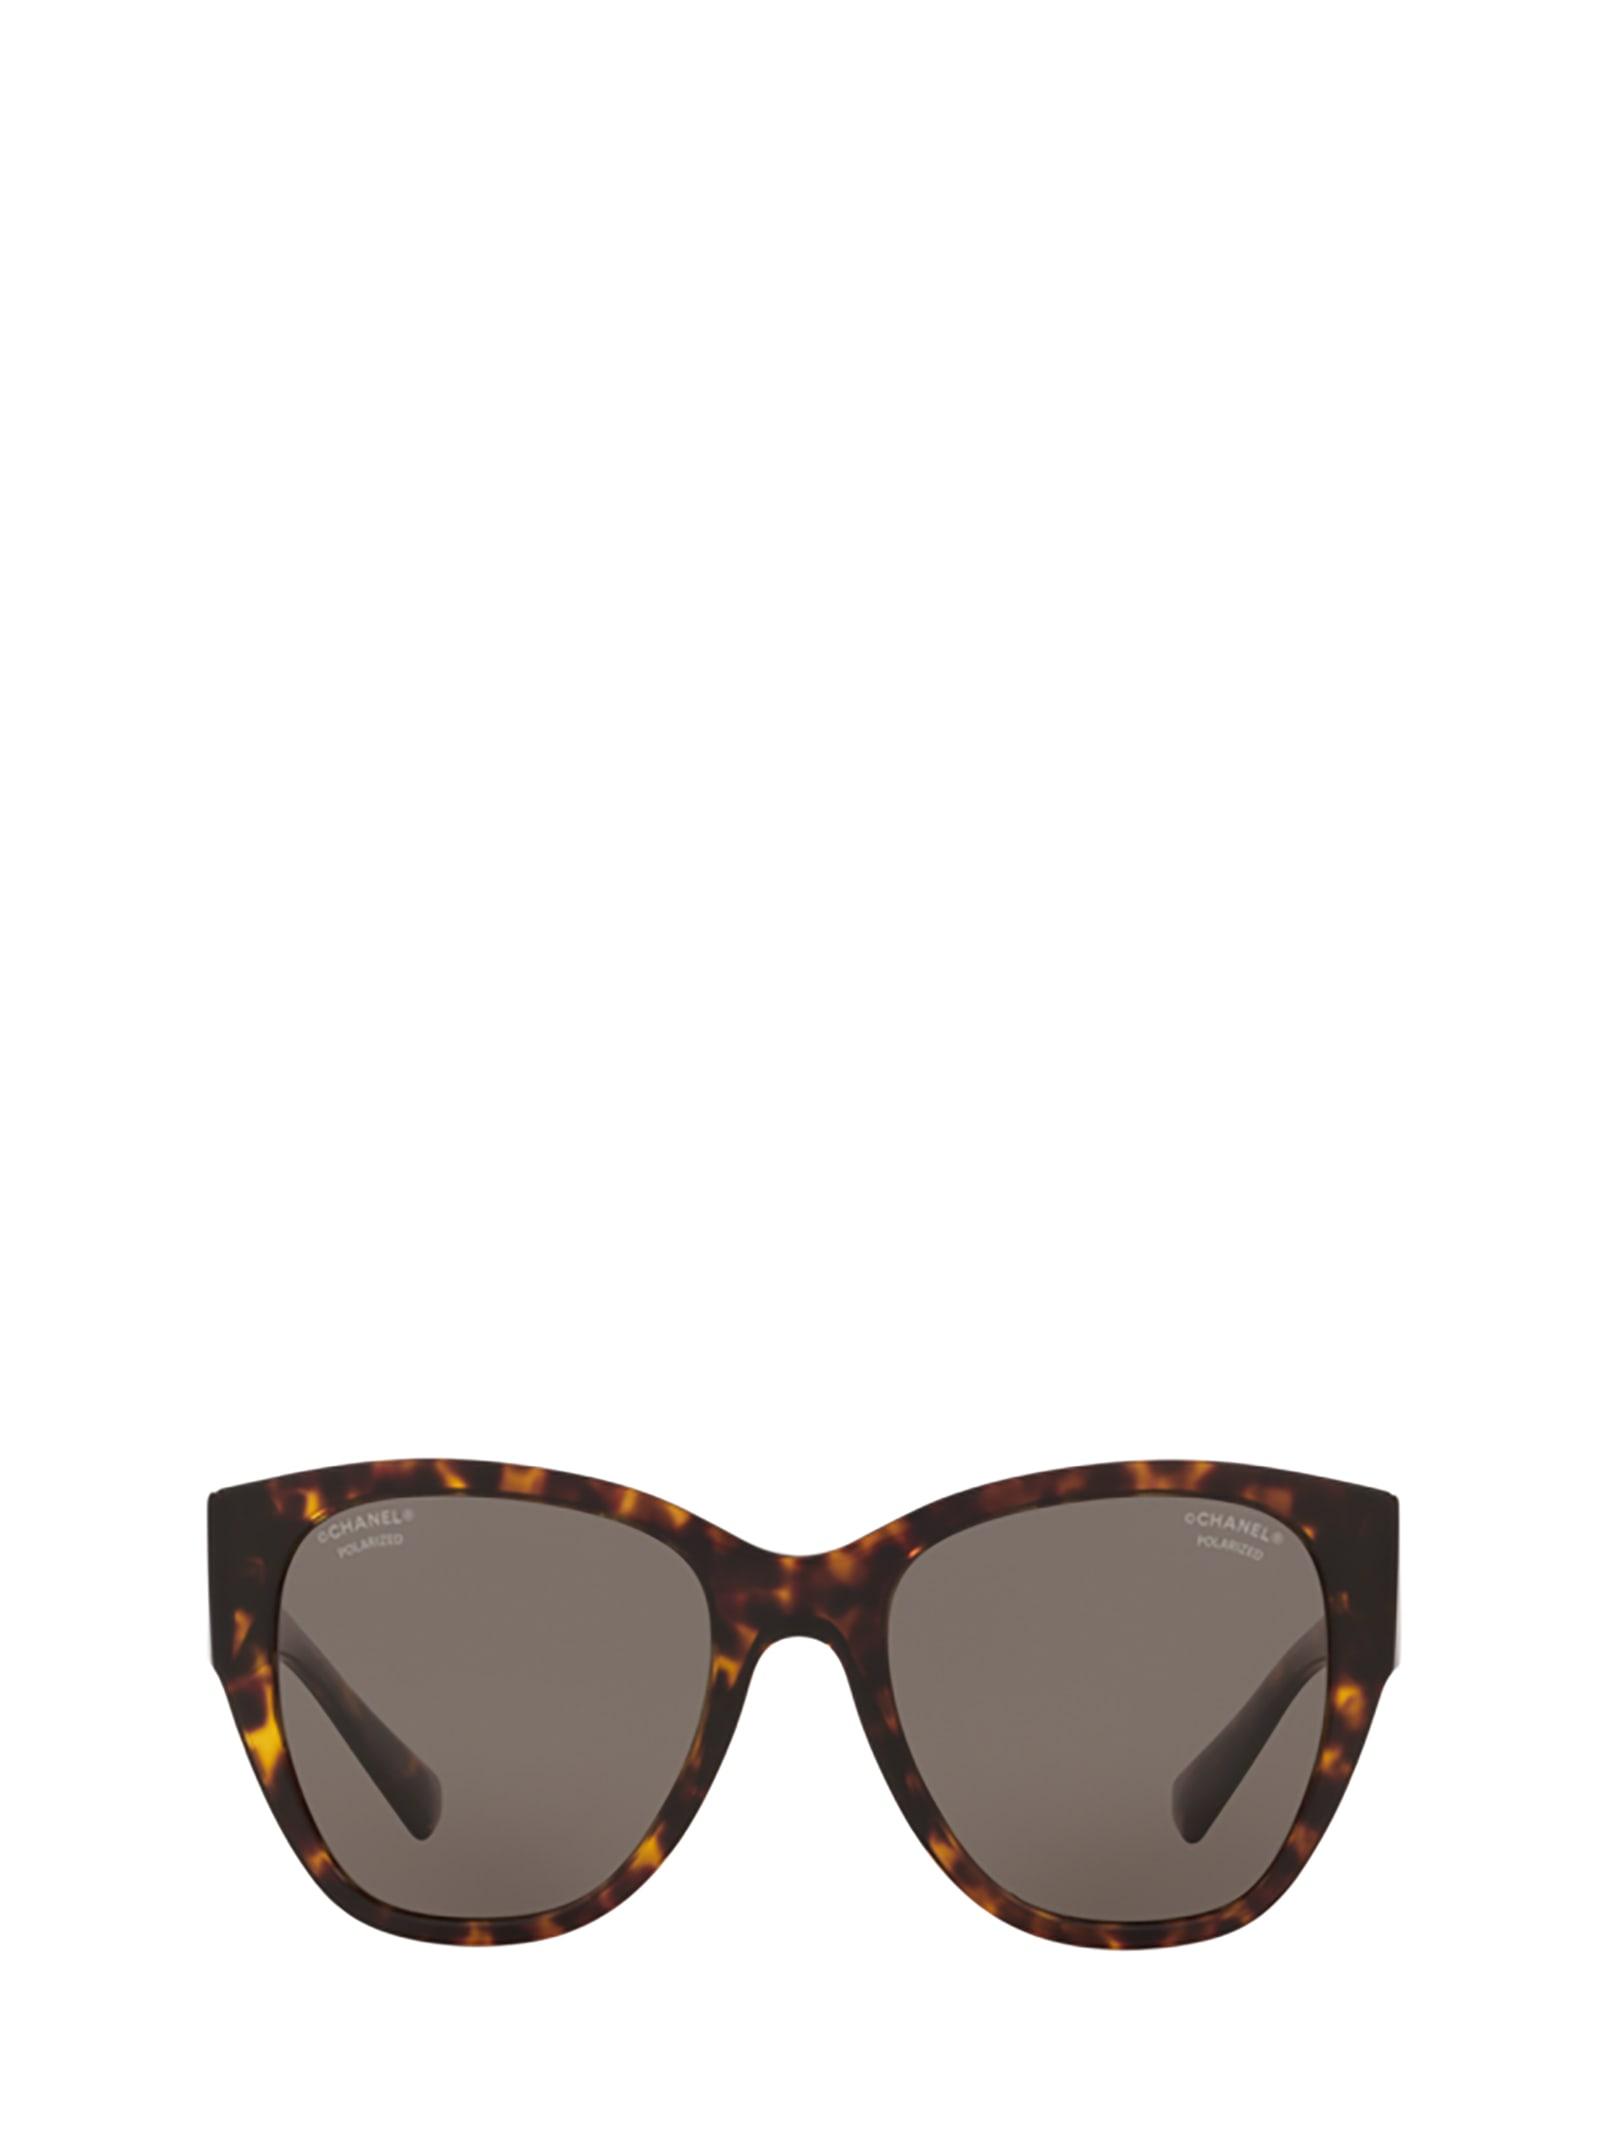 Chanel Chanel Ch5412 Dark Havana Sunglasses